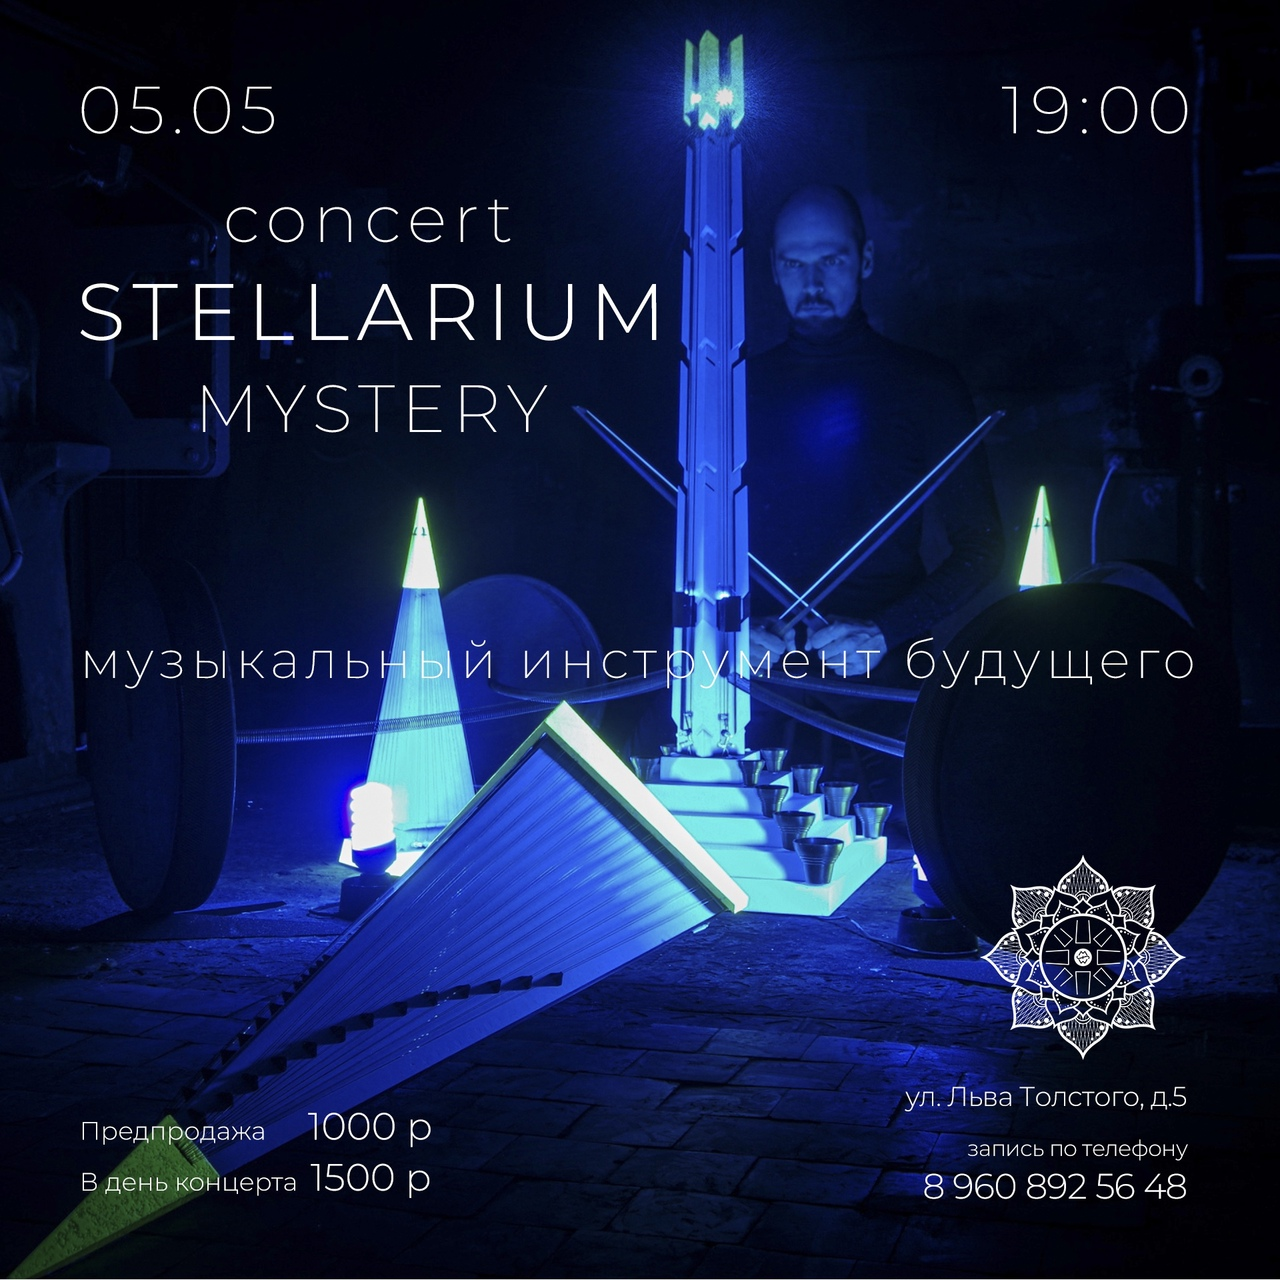 Афиша 05.05 - STELLARIUM MYSTERY - Волгоград